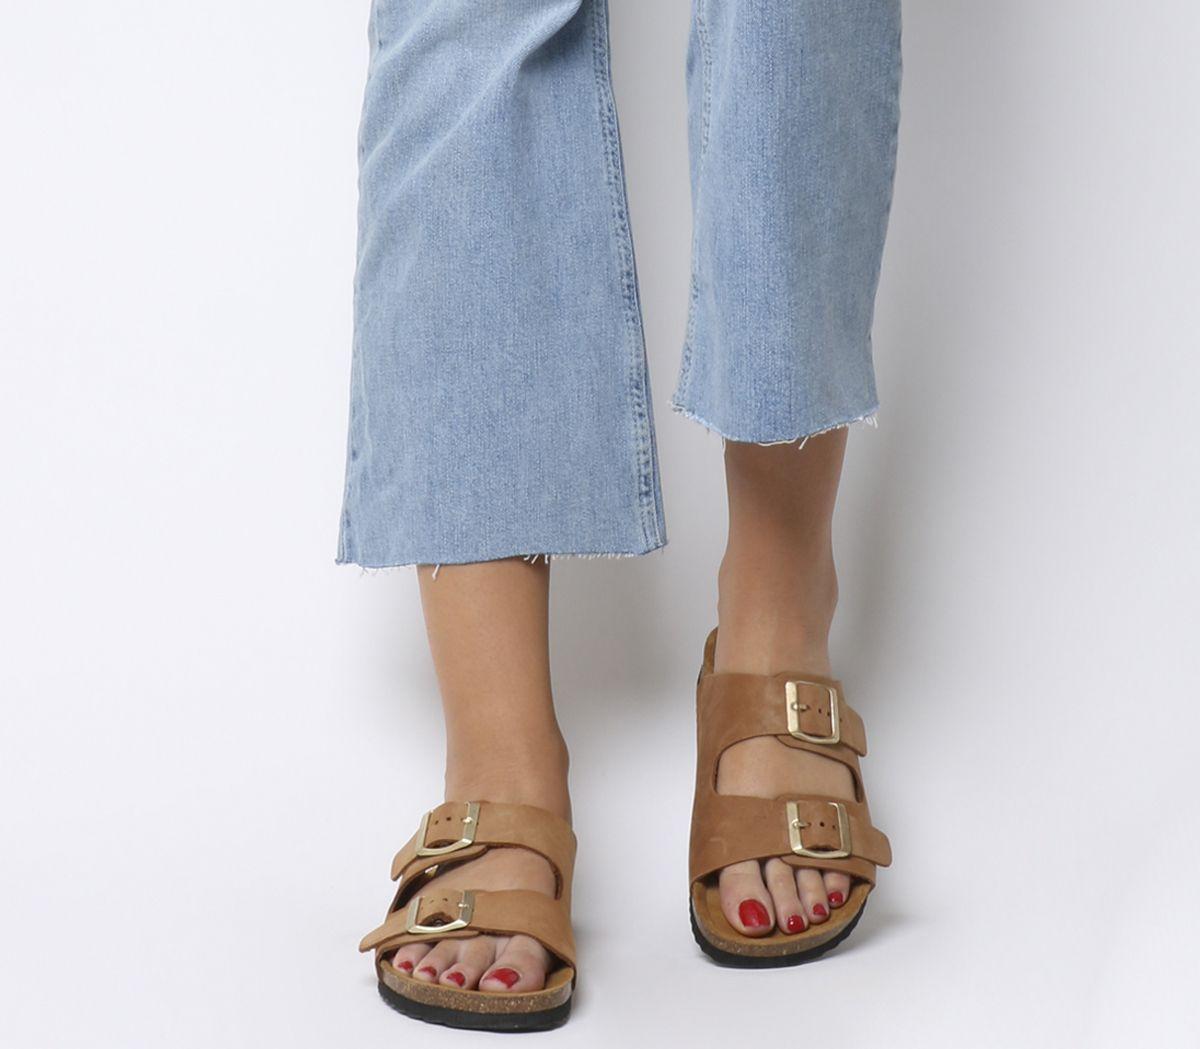 cc2085584 Office Hype 2 Double Strap Sandals Nude Nubuck - Sandals